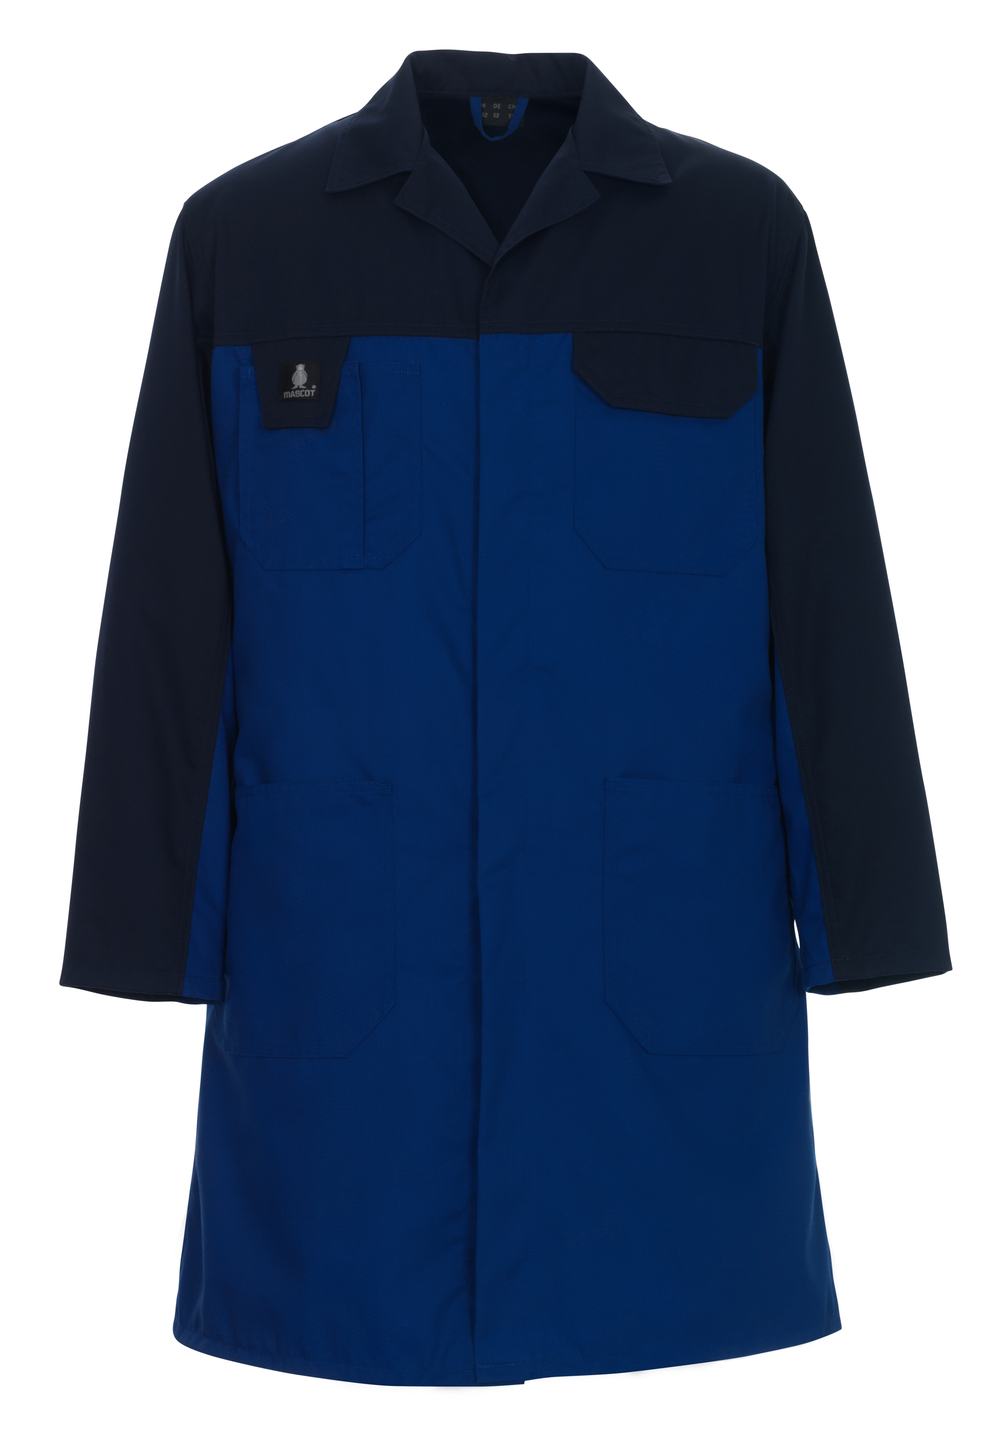 00959-330-1101 Warehouse Coat - royal/navy